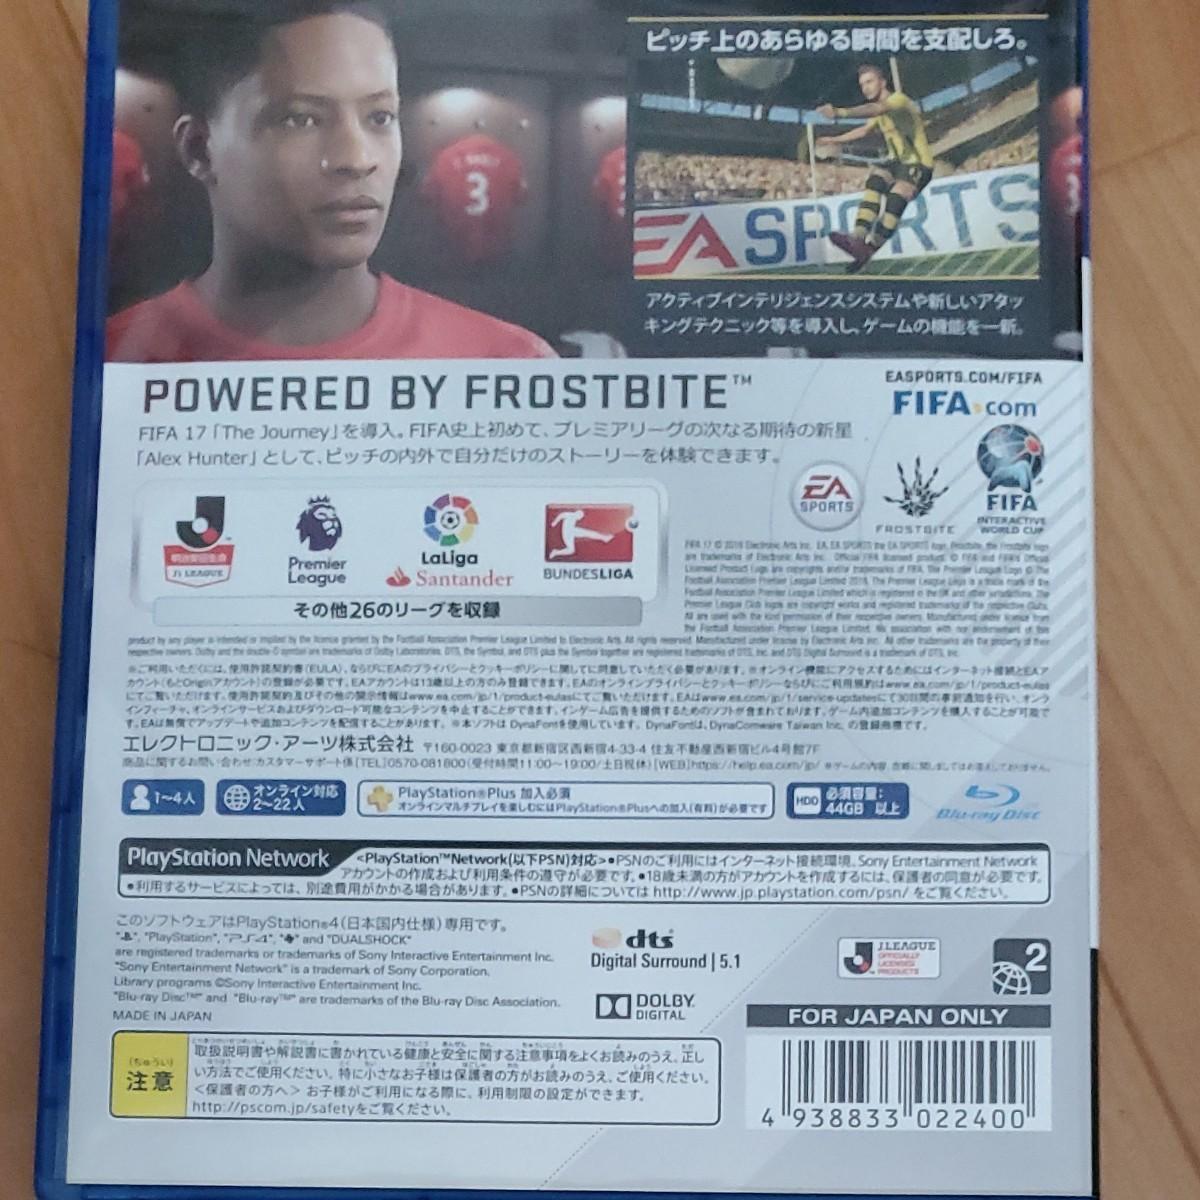 FIFA17 PS4ソフト PS4 FIFA